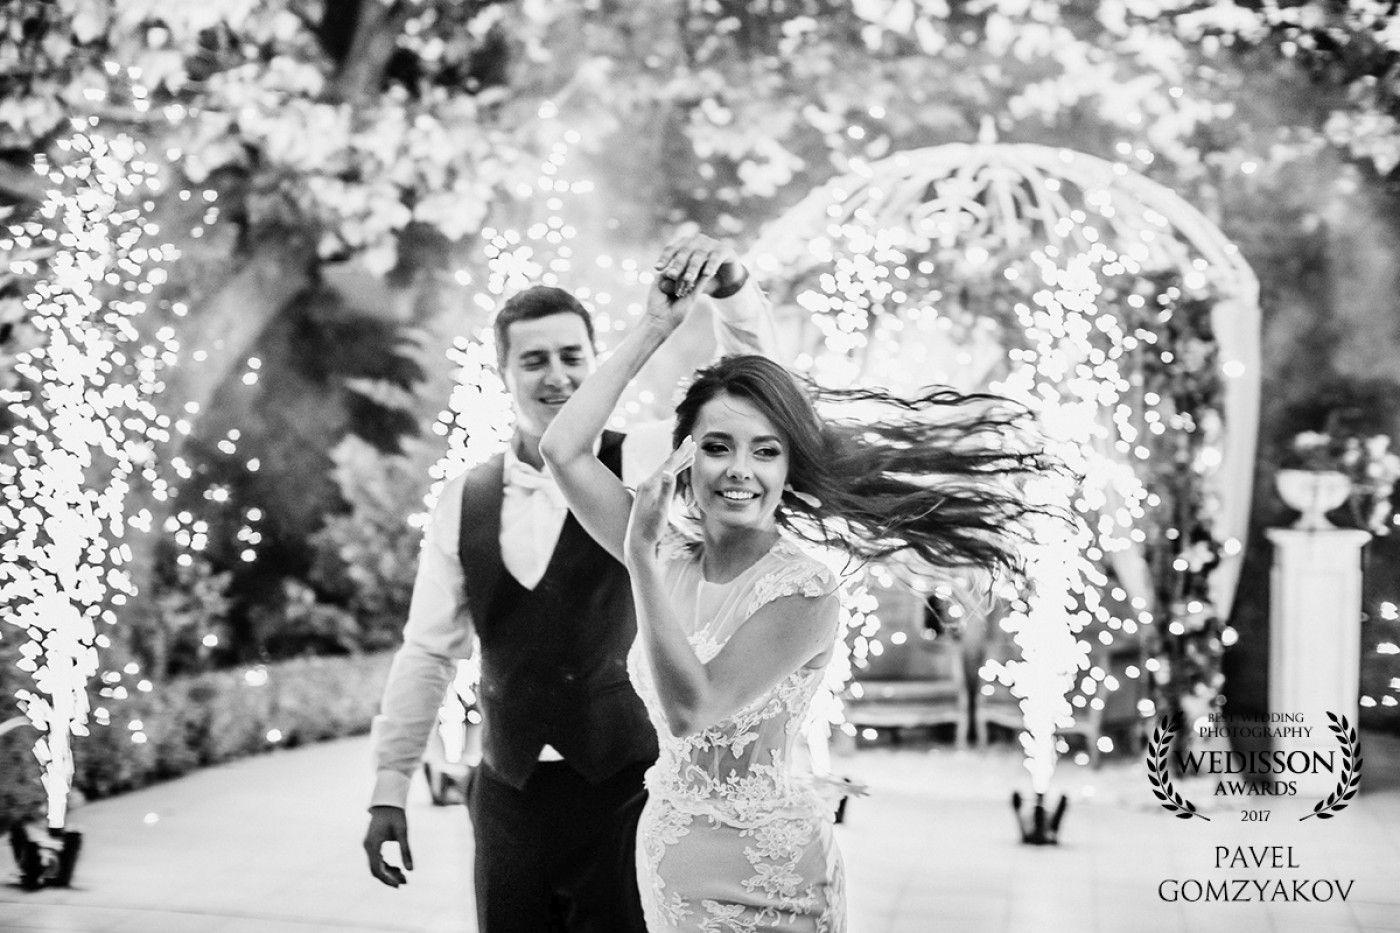 Wedding Photographer Pavel Gomzyakov Pavelgo Odessa Ukraine